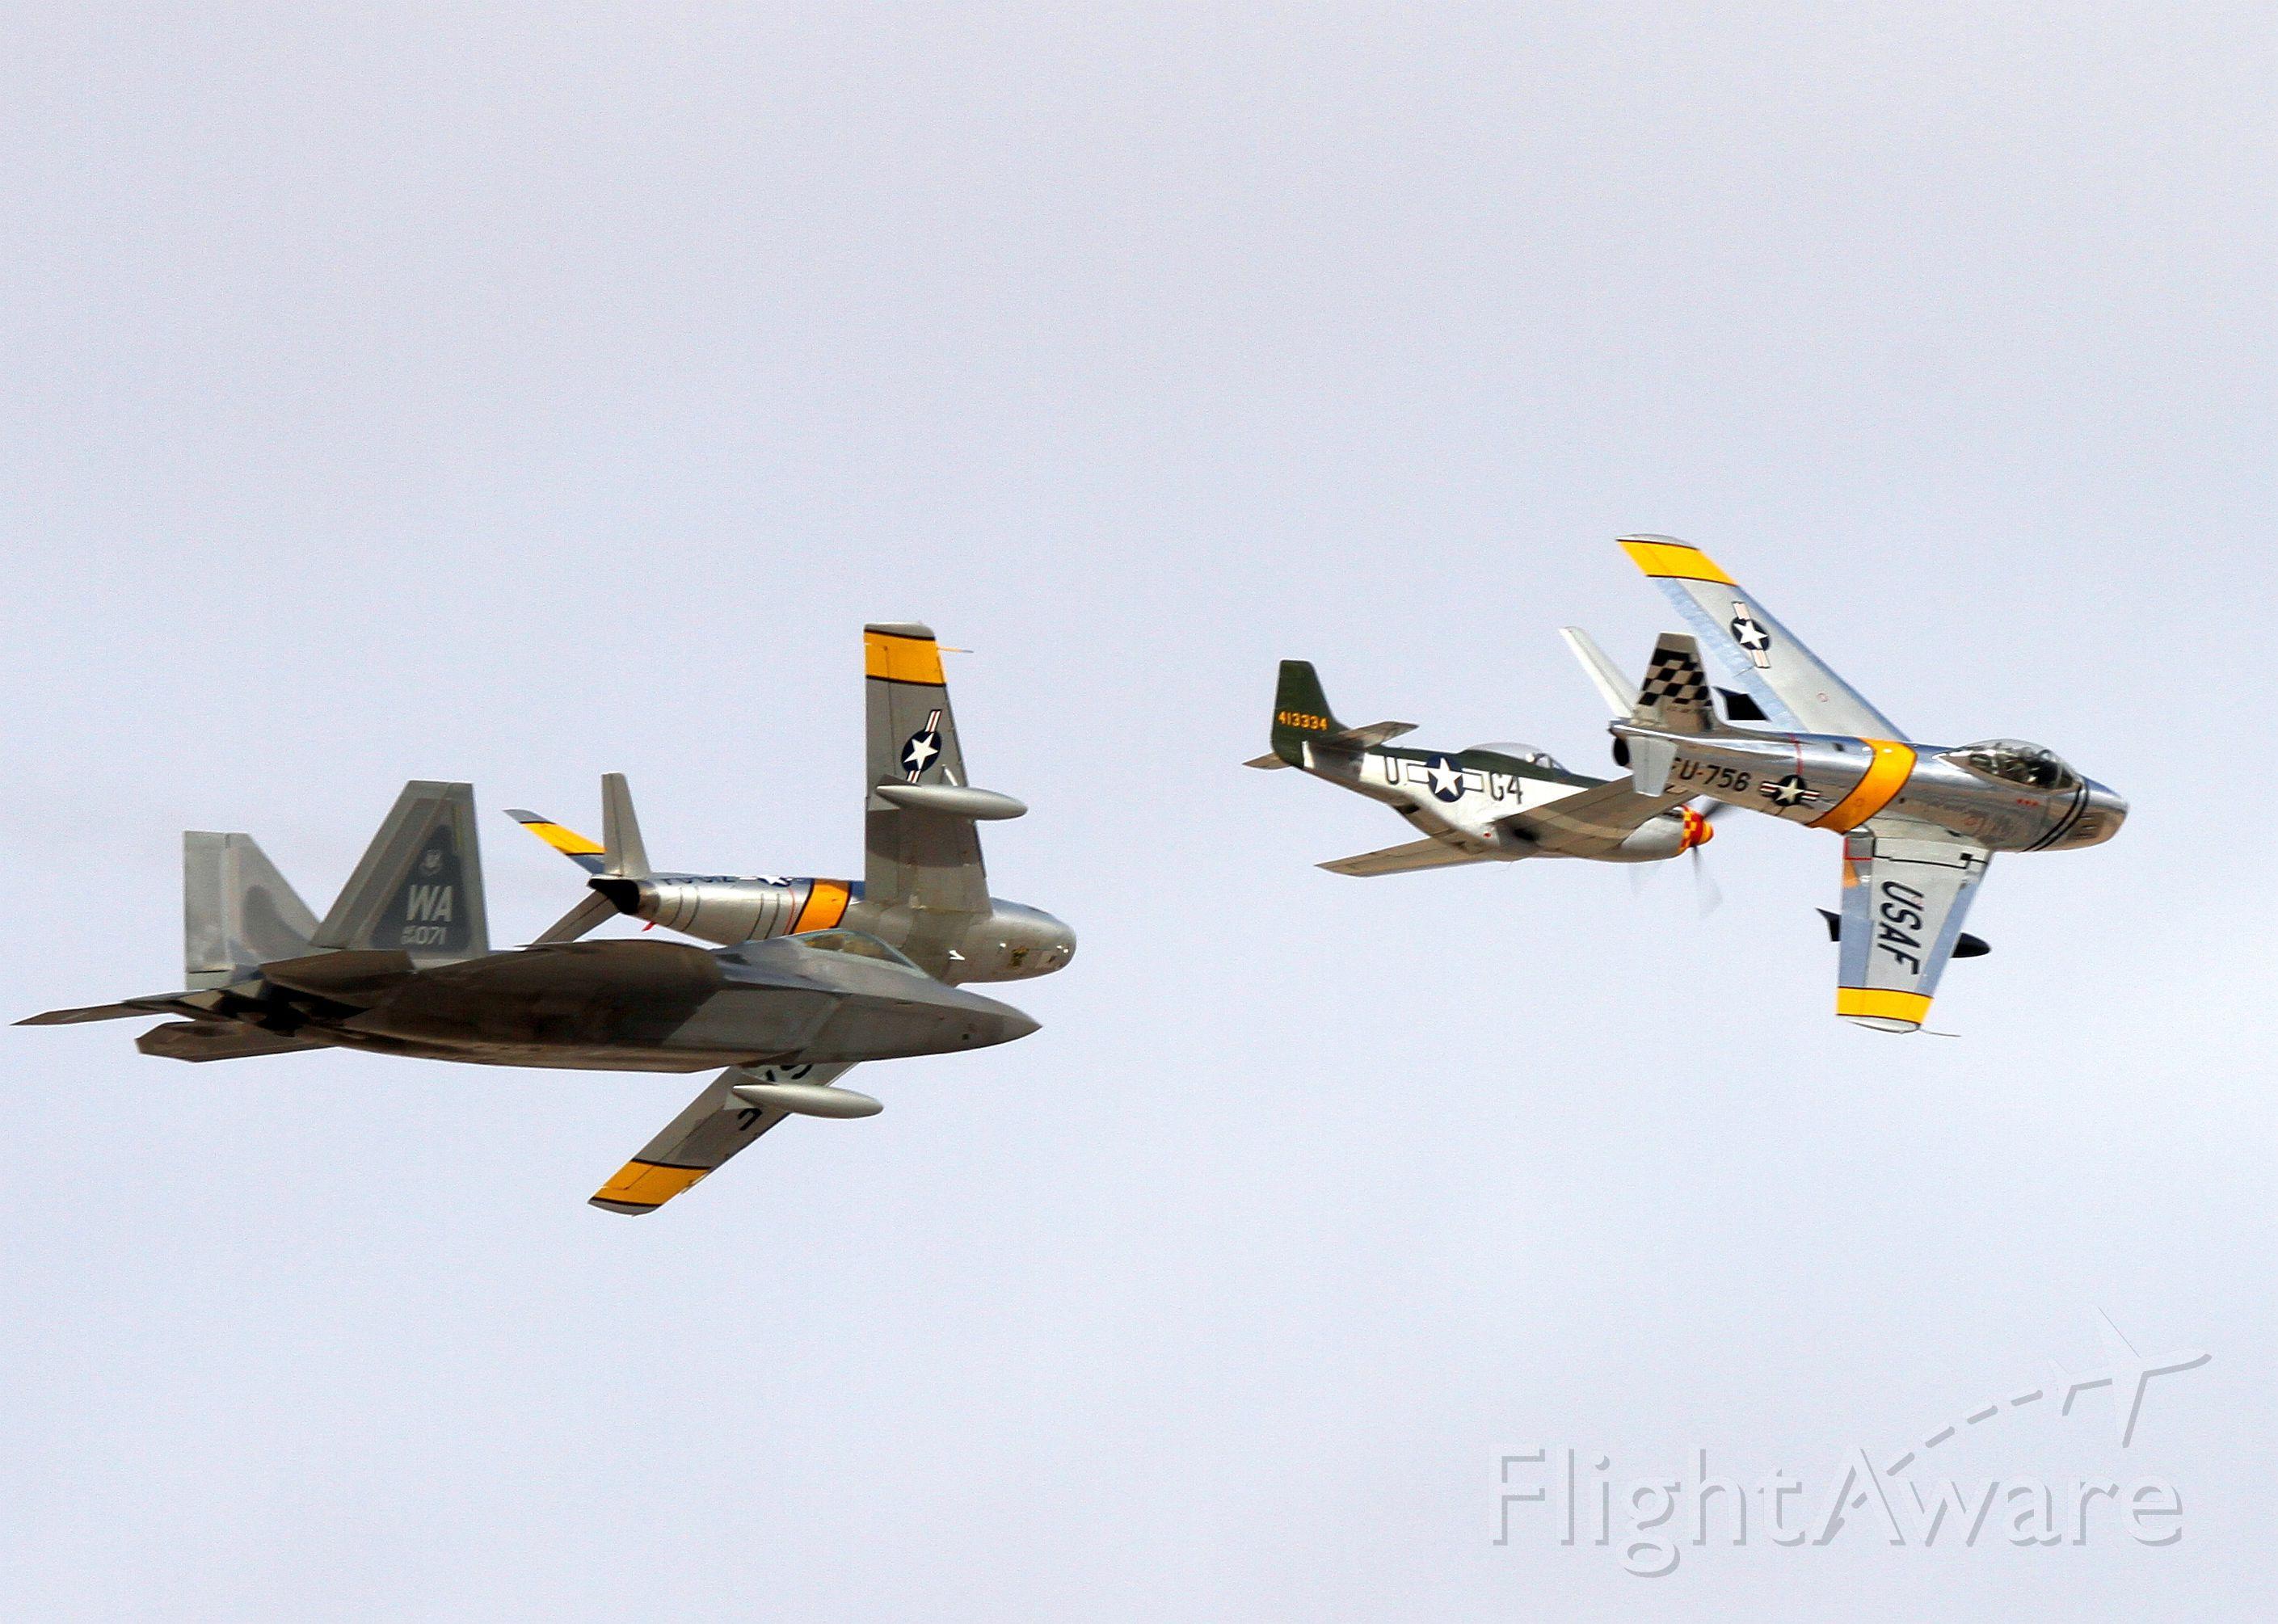 Lockheed F-22 Raptor (04071) - Heritage Flight Aviation Nation 2012